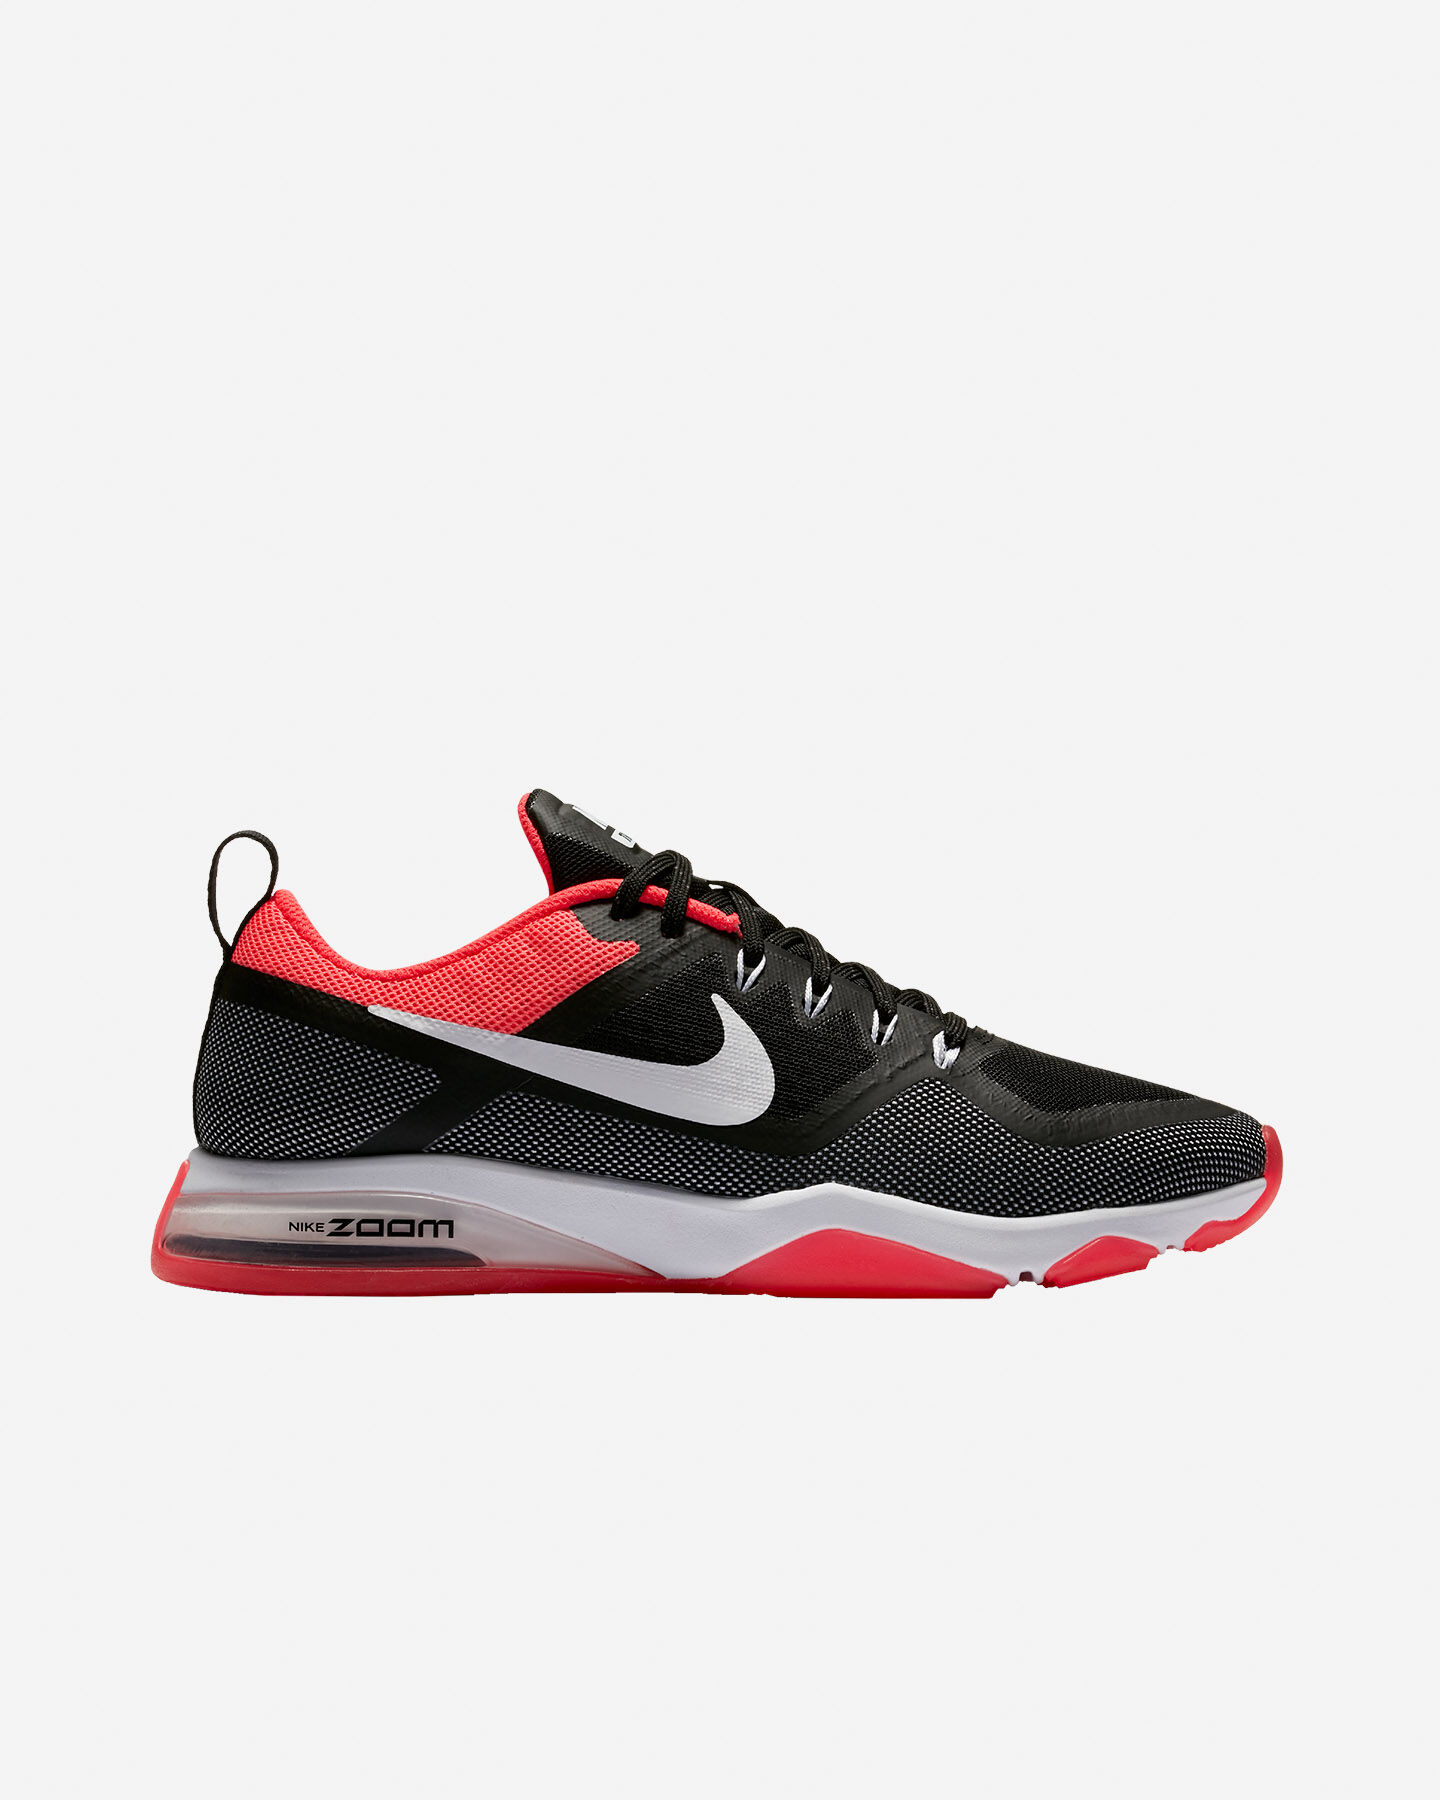 Donna Nike Air Zoom Allenamento Fitness Scarpe sportive 904645 006